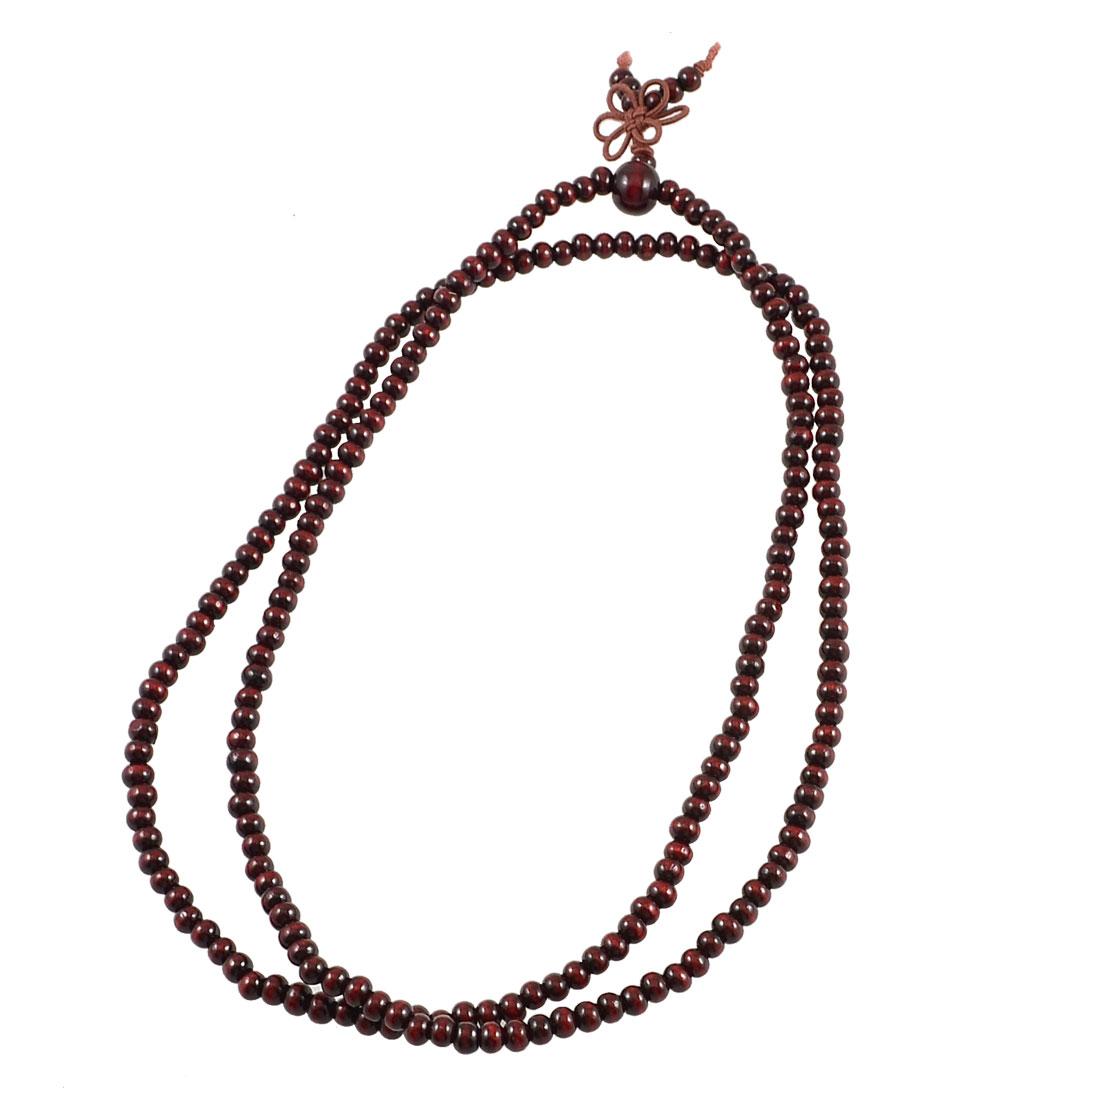 Multifunction Dark Brown Round Wood Beads Elastic Sandalwood Bracelet Necklace